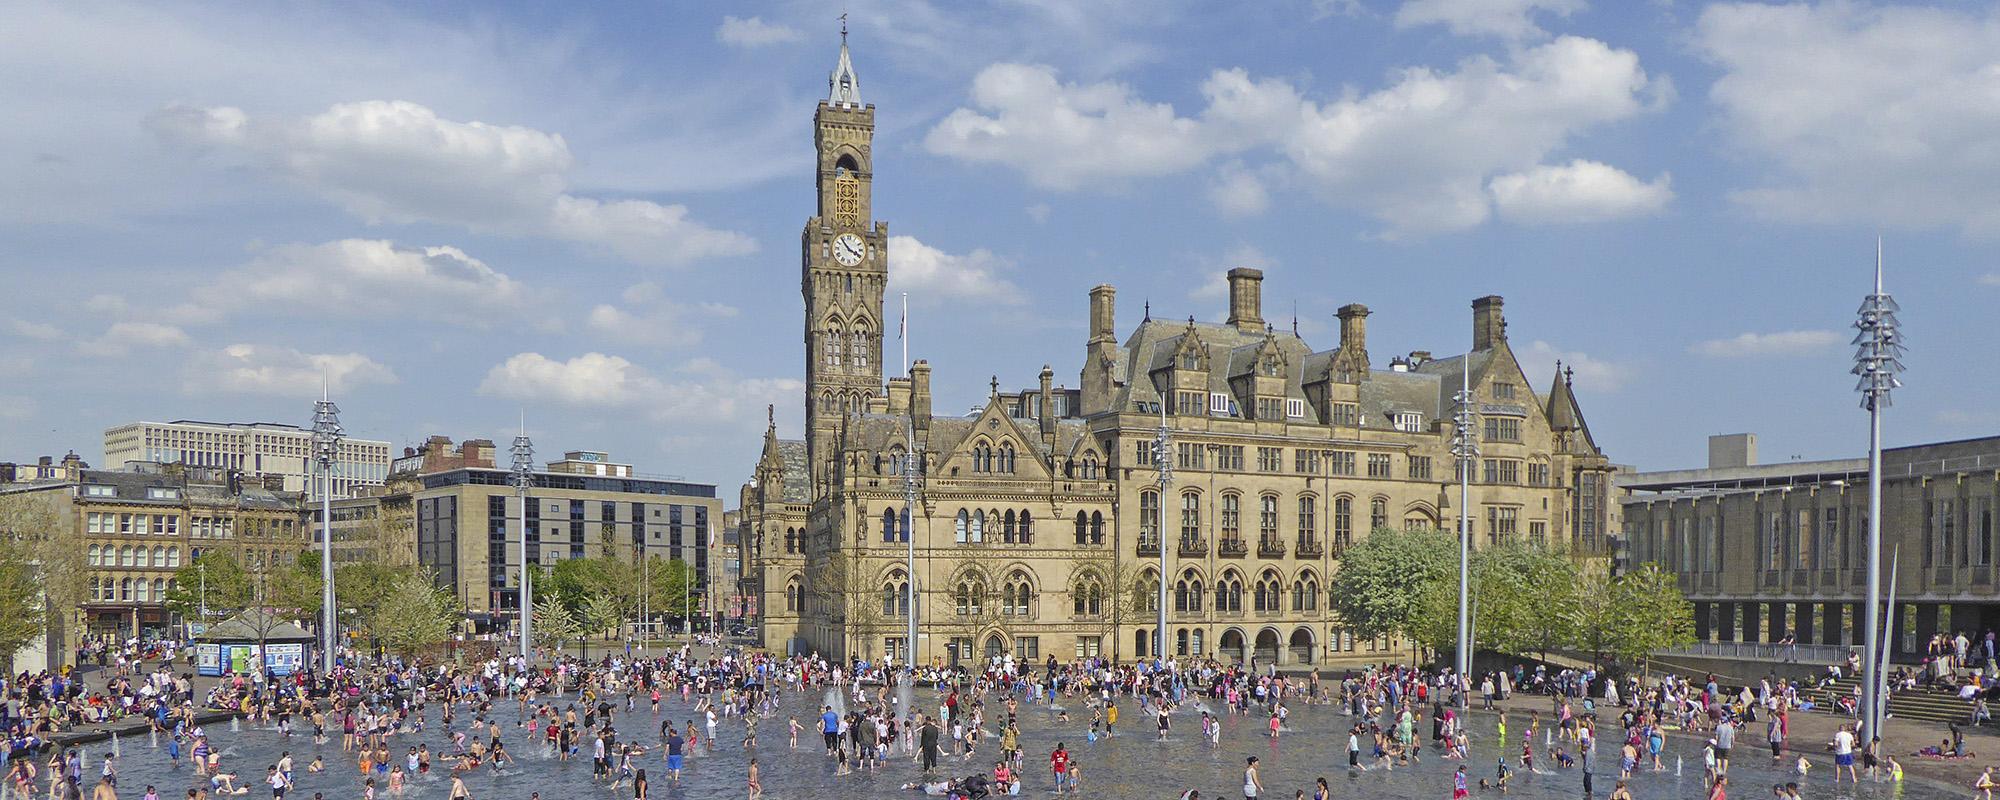 Bradford's City Park (photo: Tim Green)